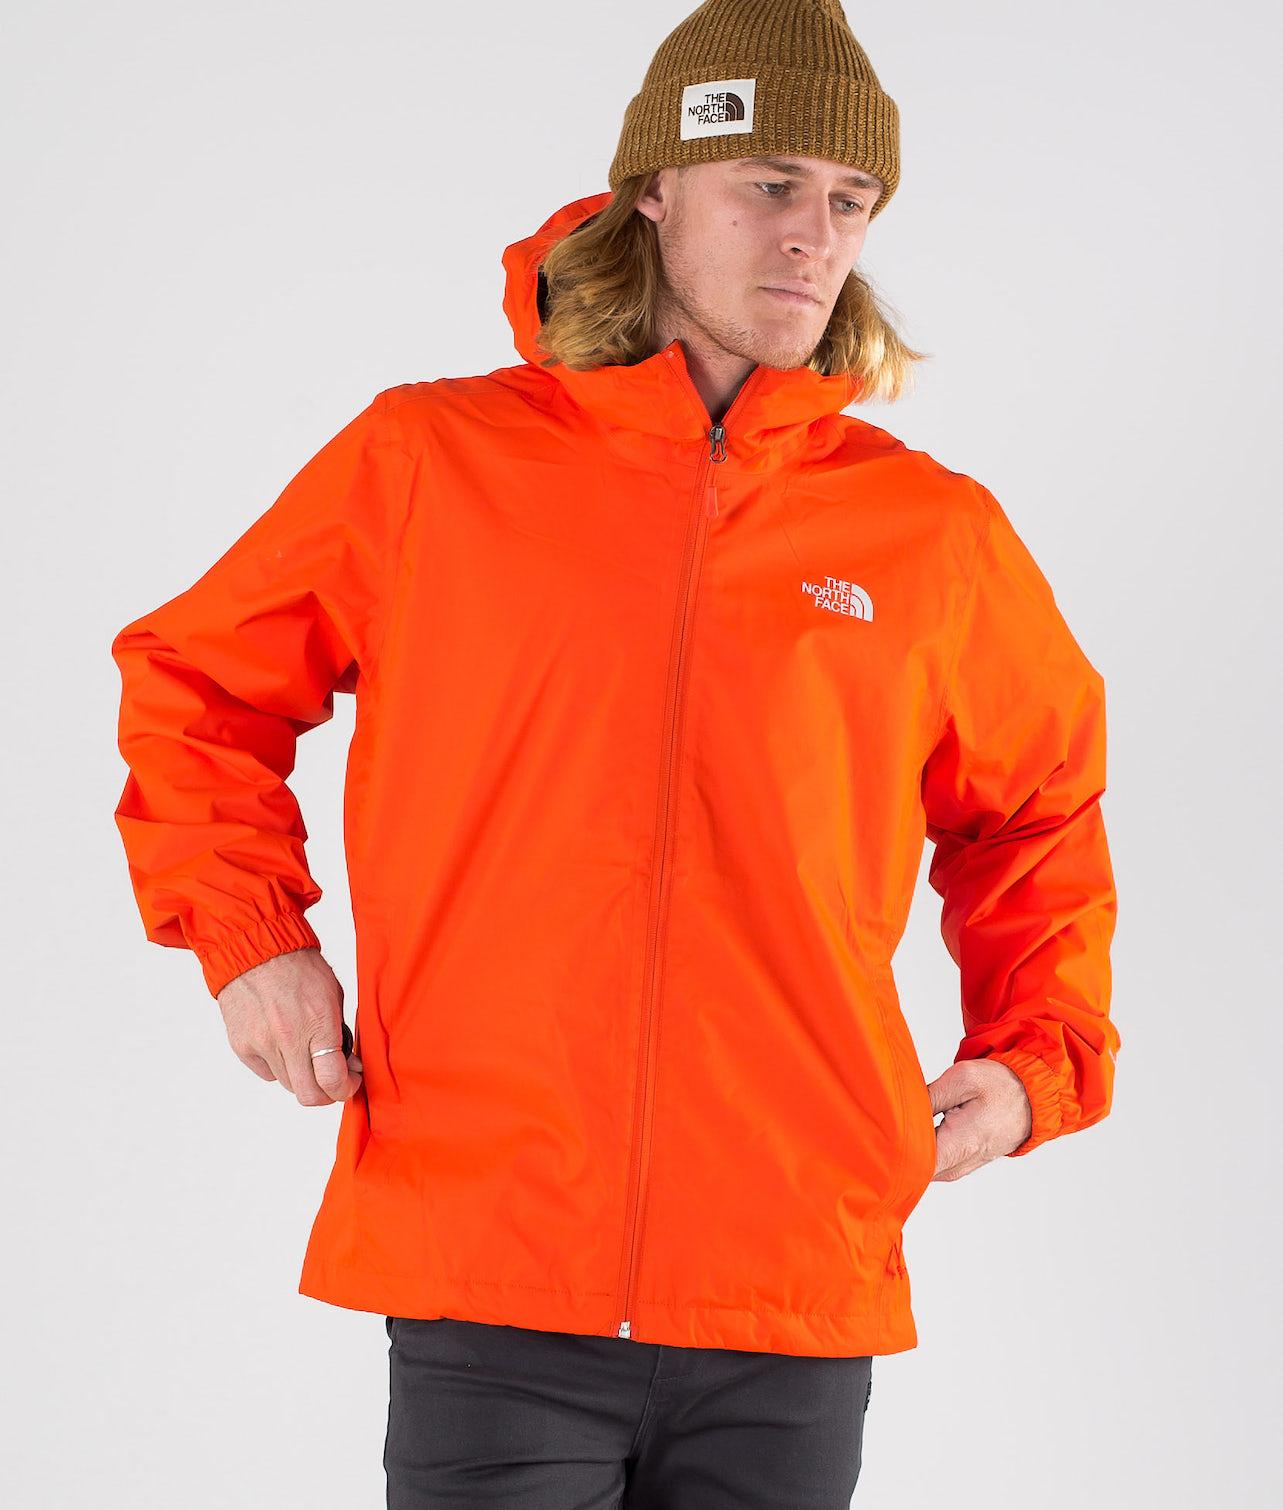 The North Face Quest Jacka Acrylic Orange